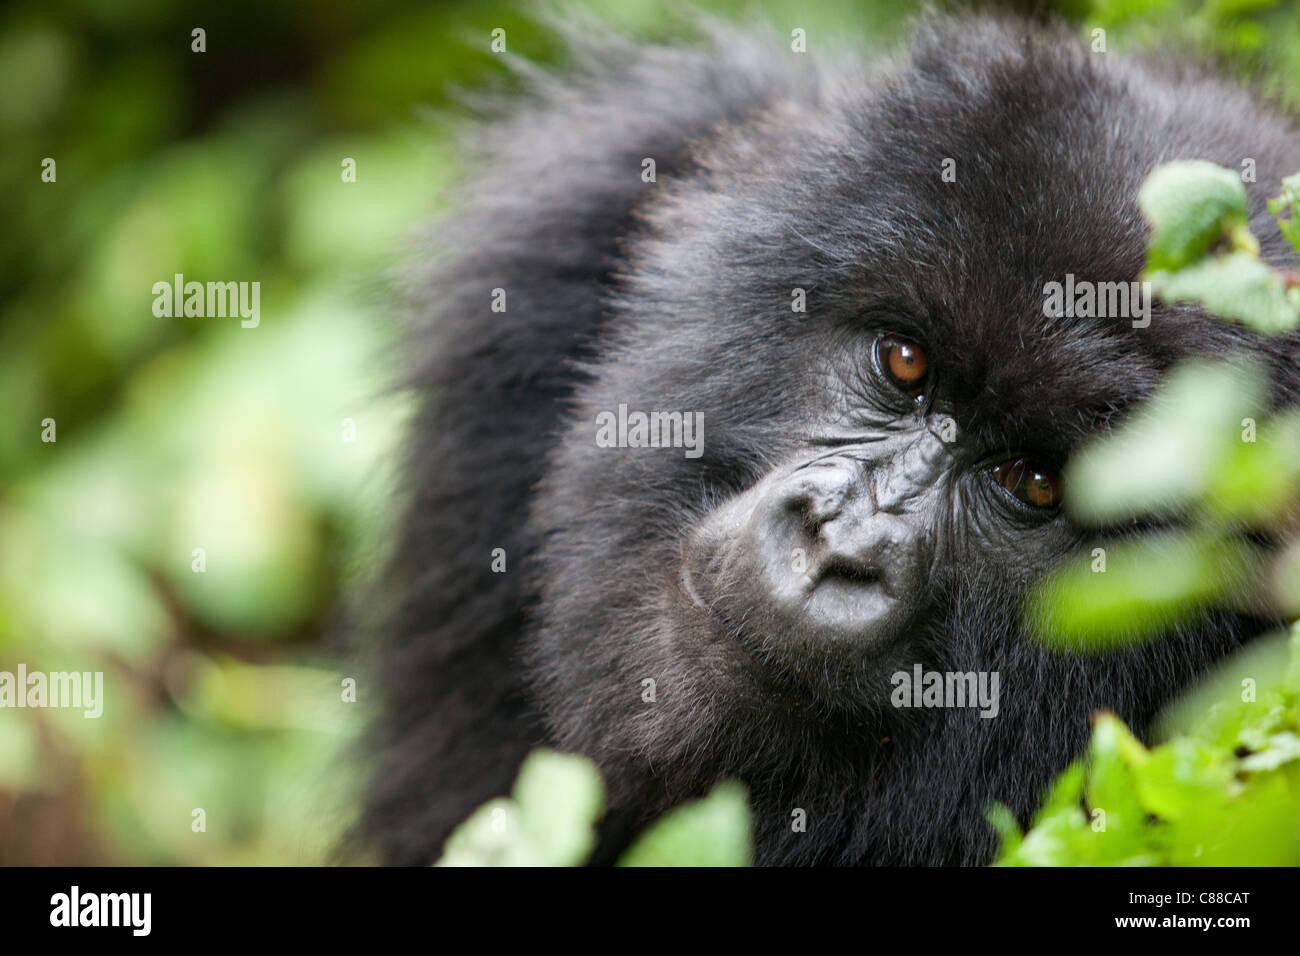 Adolescant Rwanda Mountain Gorilla - Stock Image